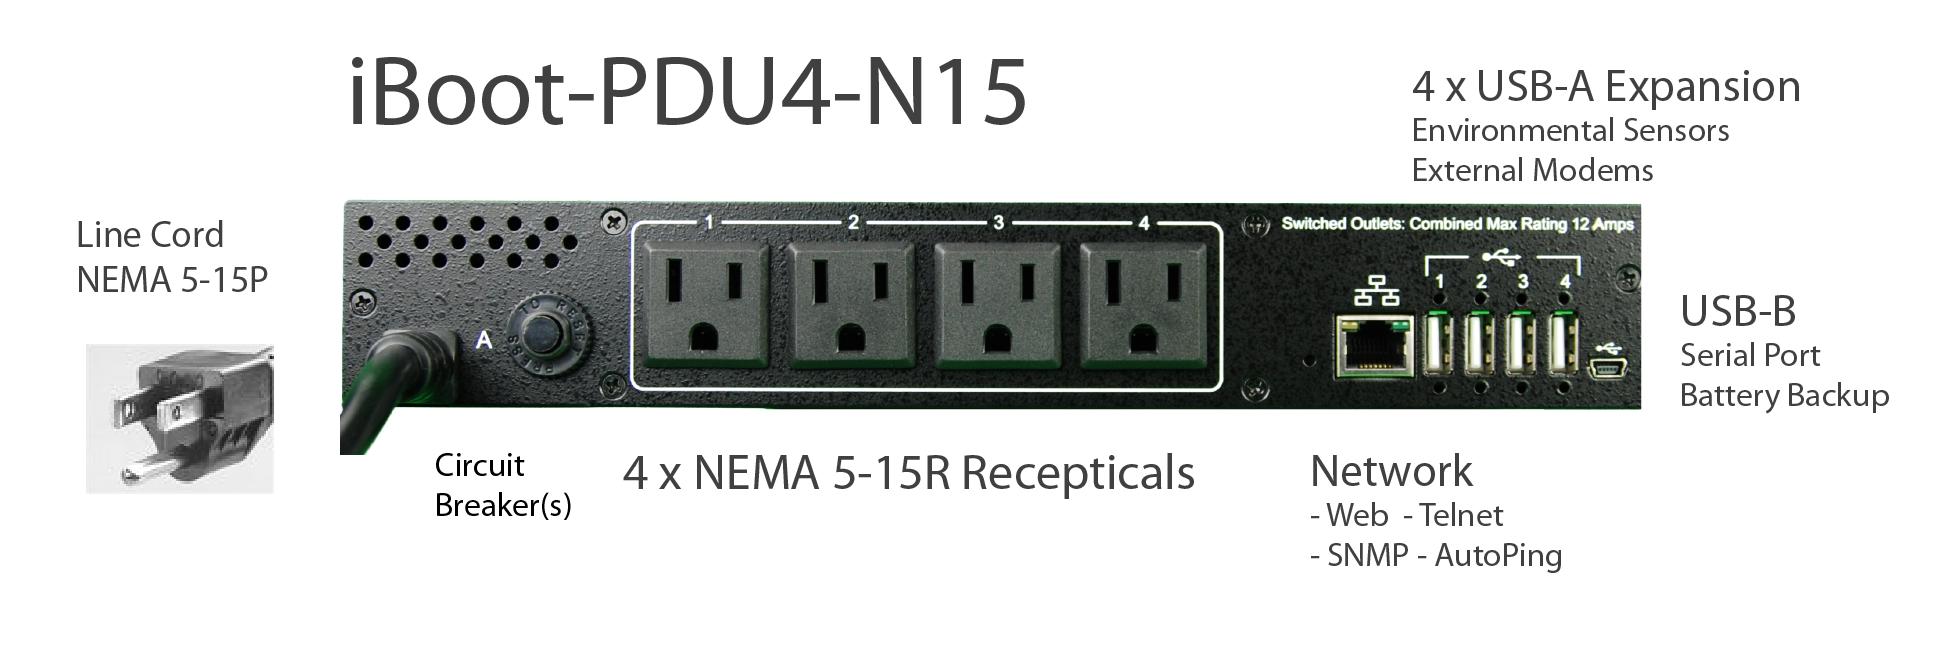 iBoot-PDU4-N15 for Remote Reboot,1 x NEMA 5-15P.